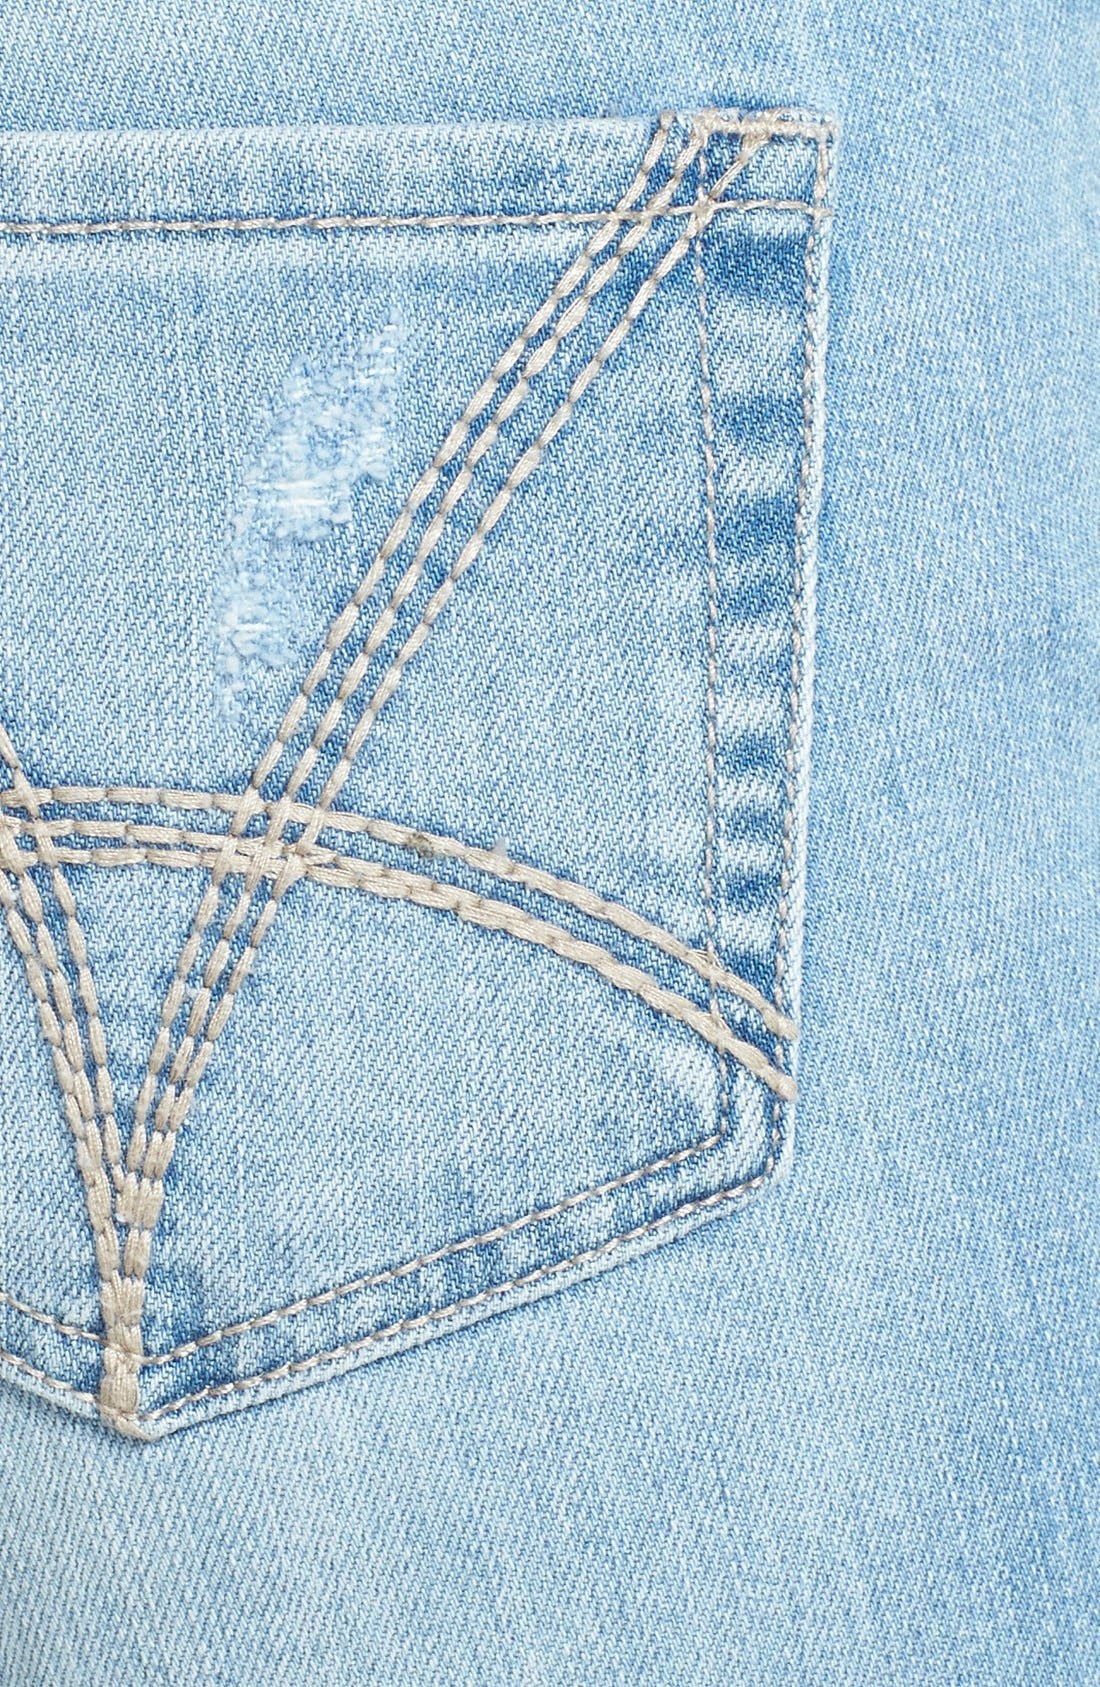 Alternate Image 3  - KUT from the Kloth 'Adele' Distressed Crop Boyfriend Jeans (Slick)